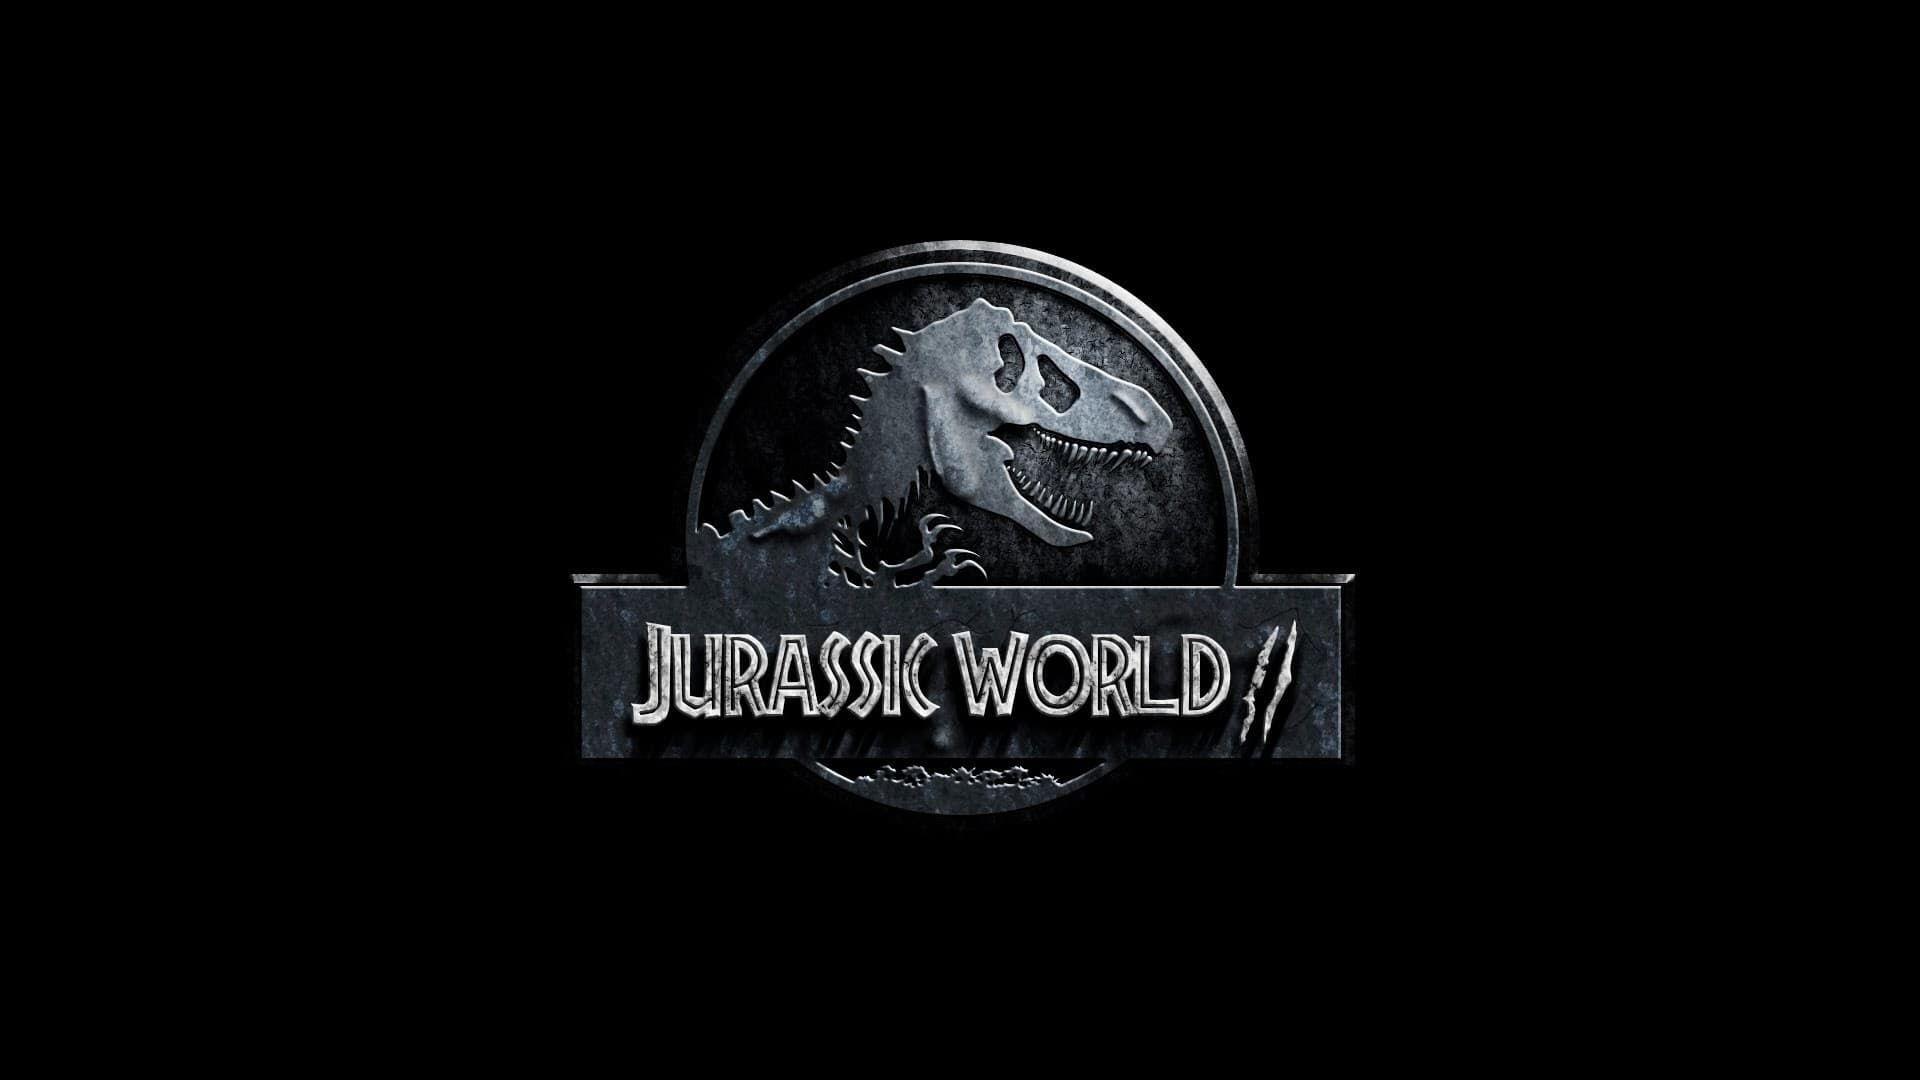 Jurassic World Bukott Birodalom 2018 Online Teljes Film Filmek Magyarul Letoltes Hd Nublar A Dinoszaur Jurassic World Falling Kingdoms Full Movies Online Free